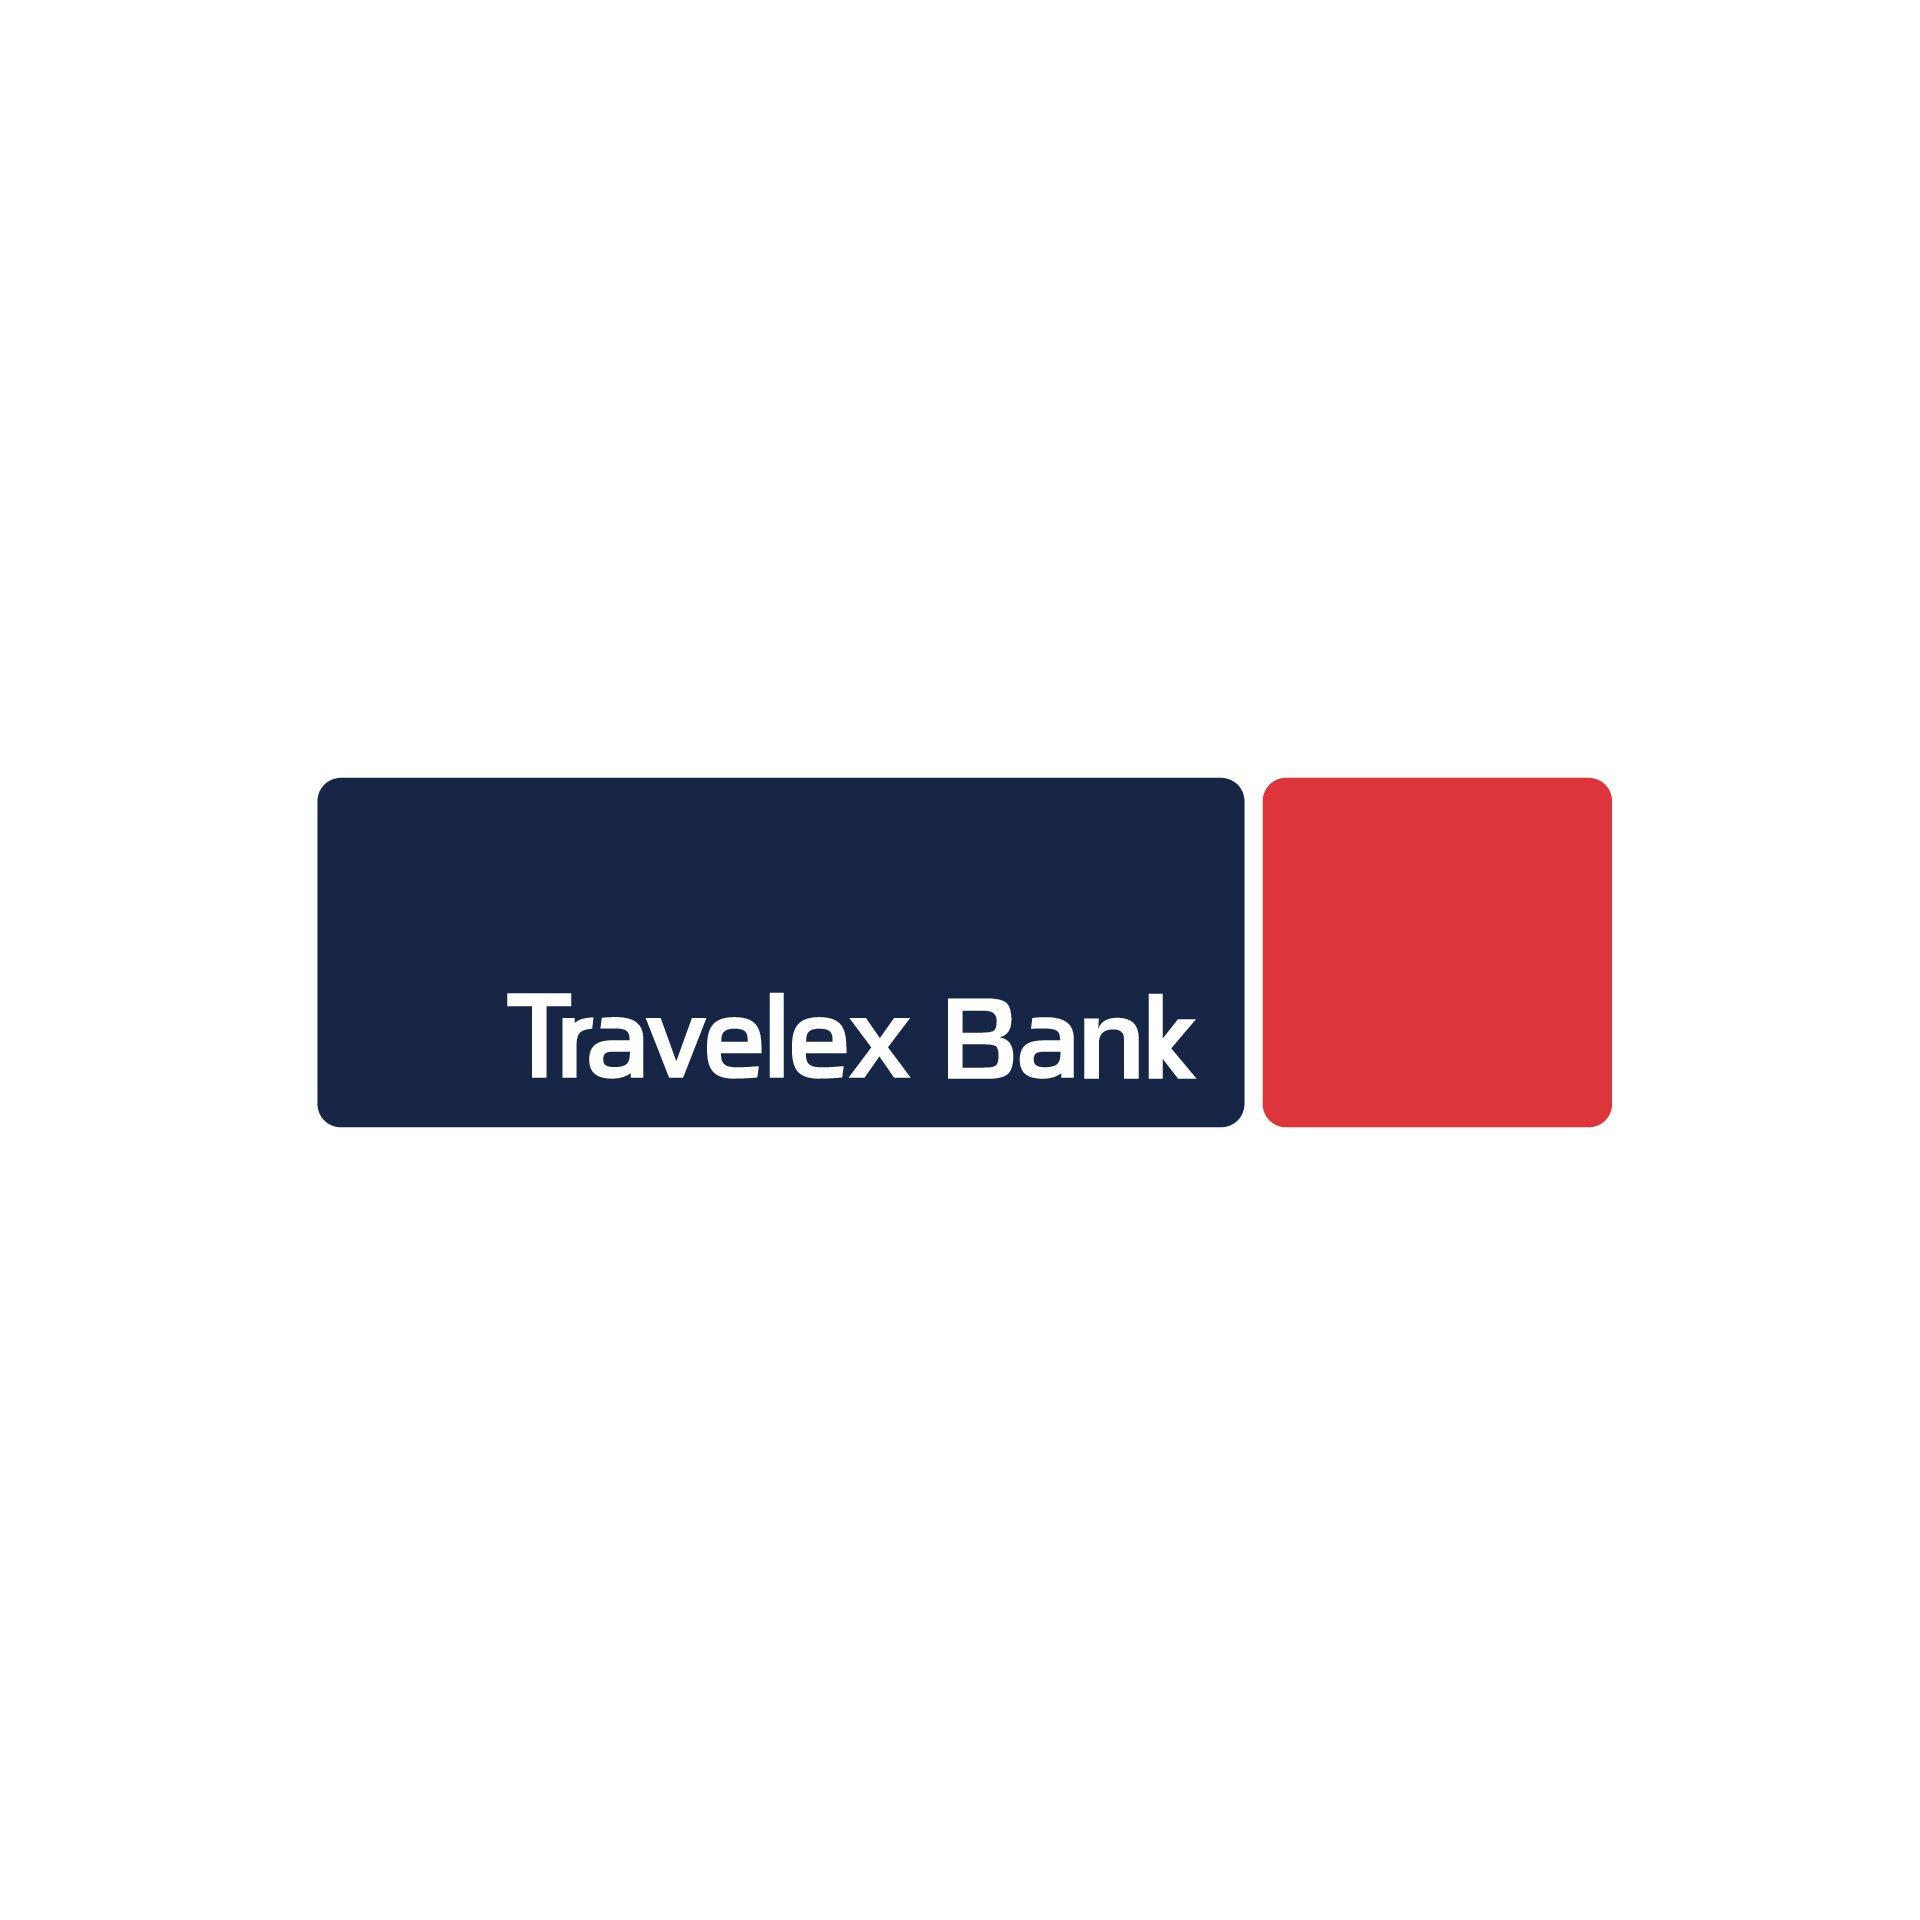 Logo TRAVELEX BANK